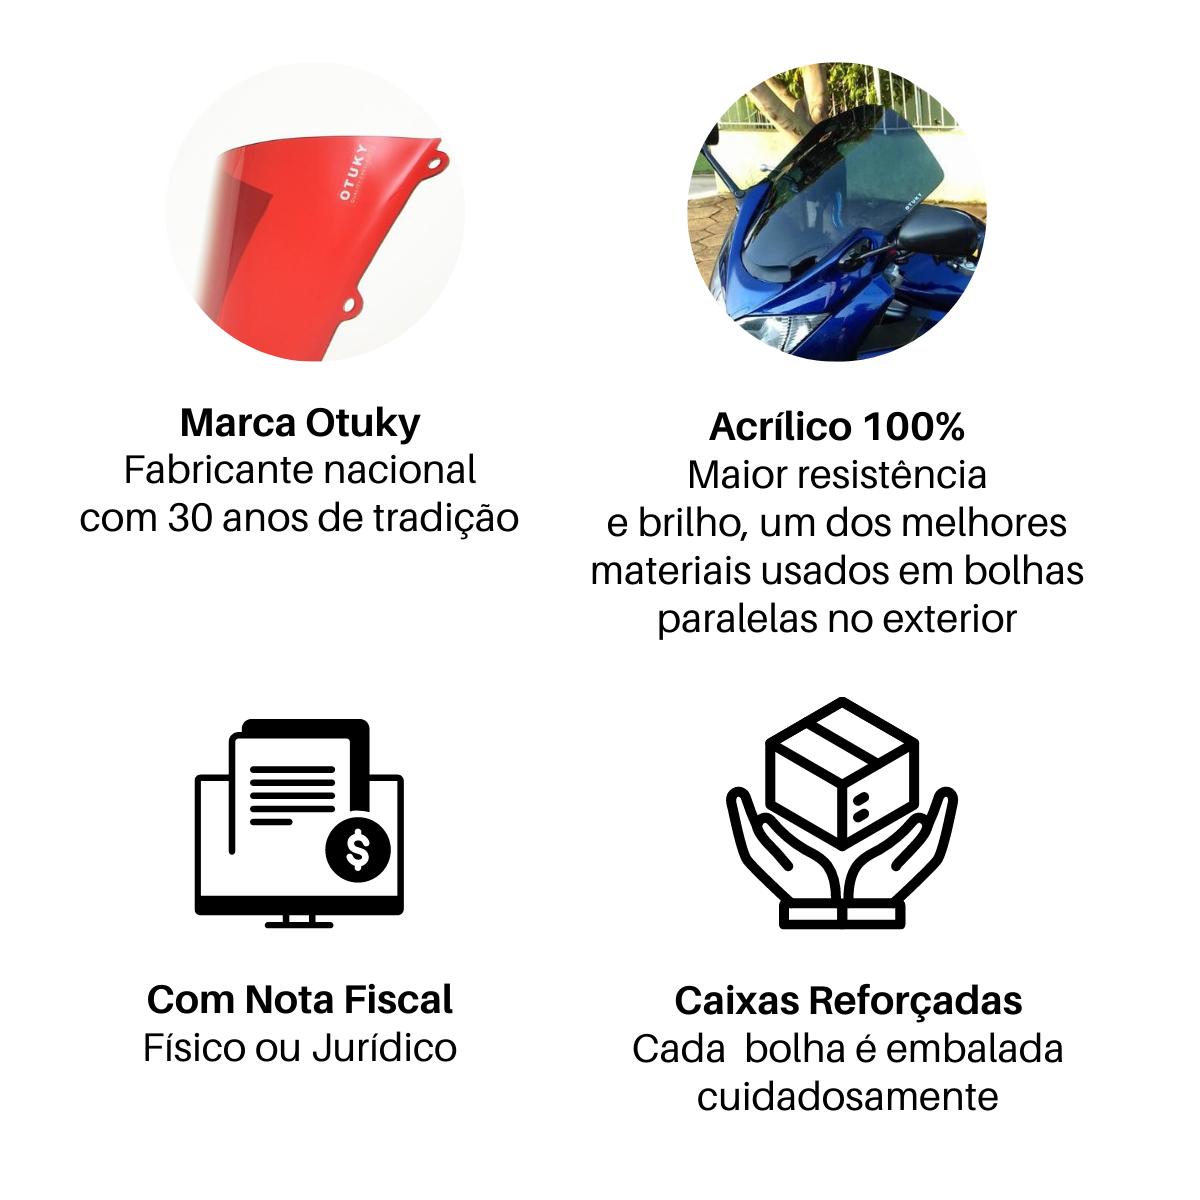 Bolha para Moto GSX 1300 R Hayabusa 2008 2009 2010 2011 2012 2013 2014 2015 2016 2017 2018 Otuky Preto